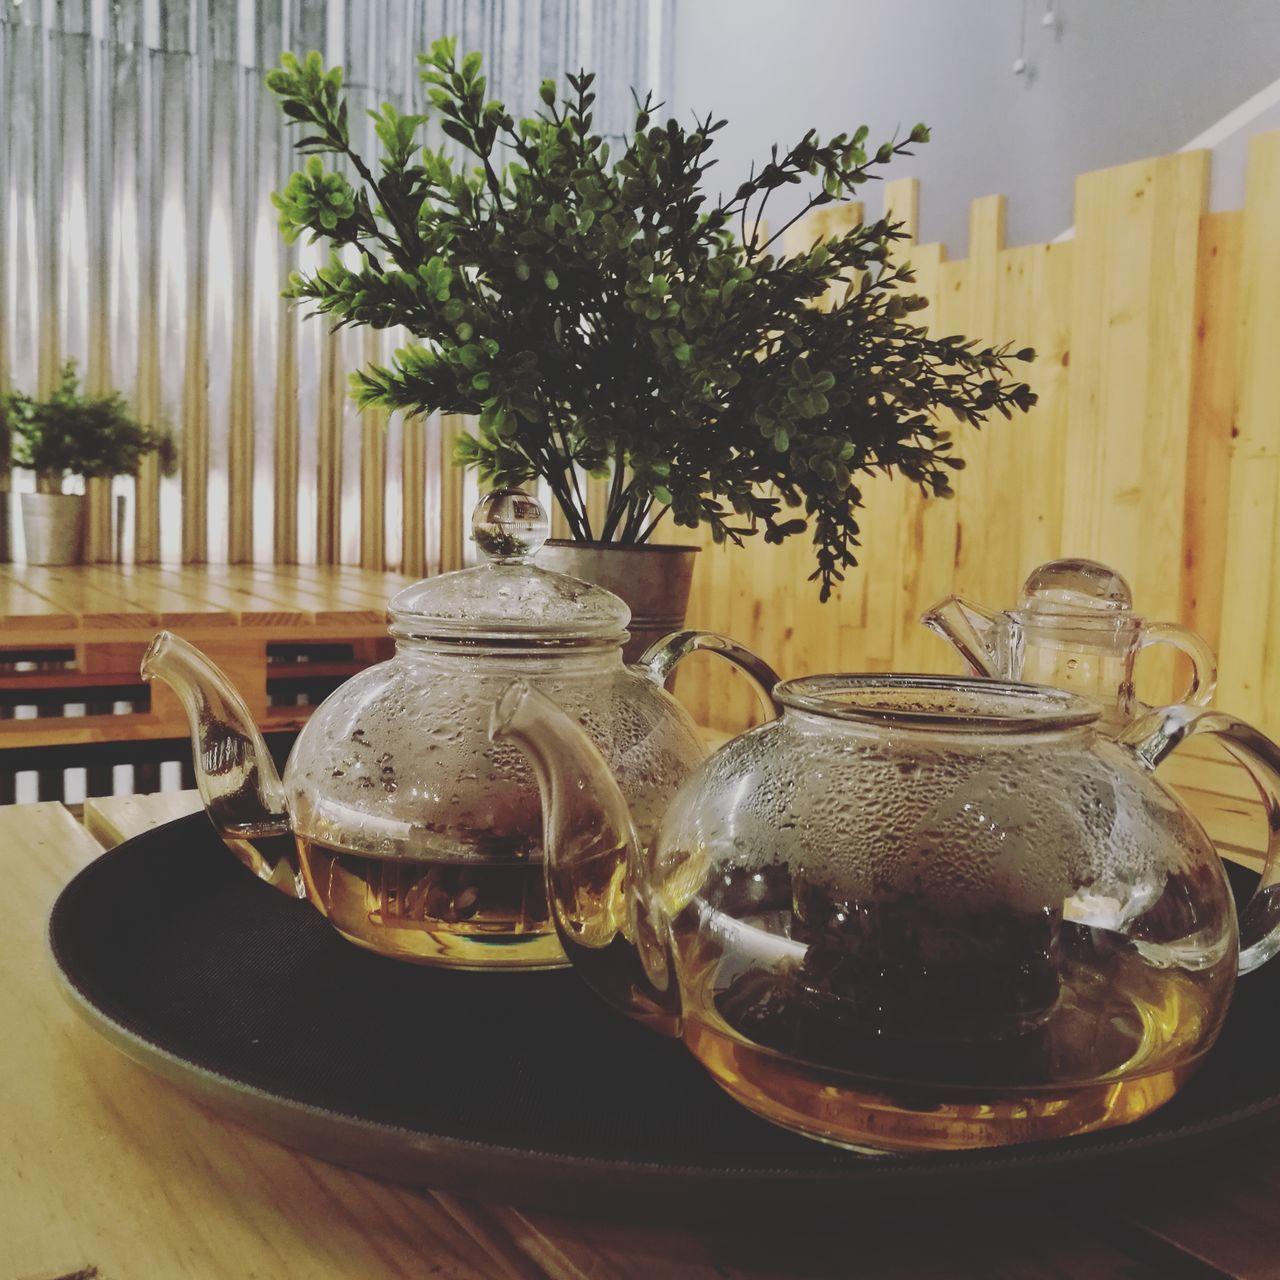 Teapot Tea Time Rose Tea Gathering Small Talk